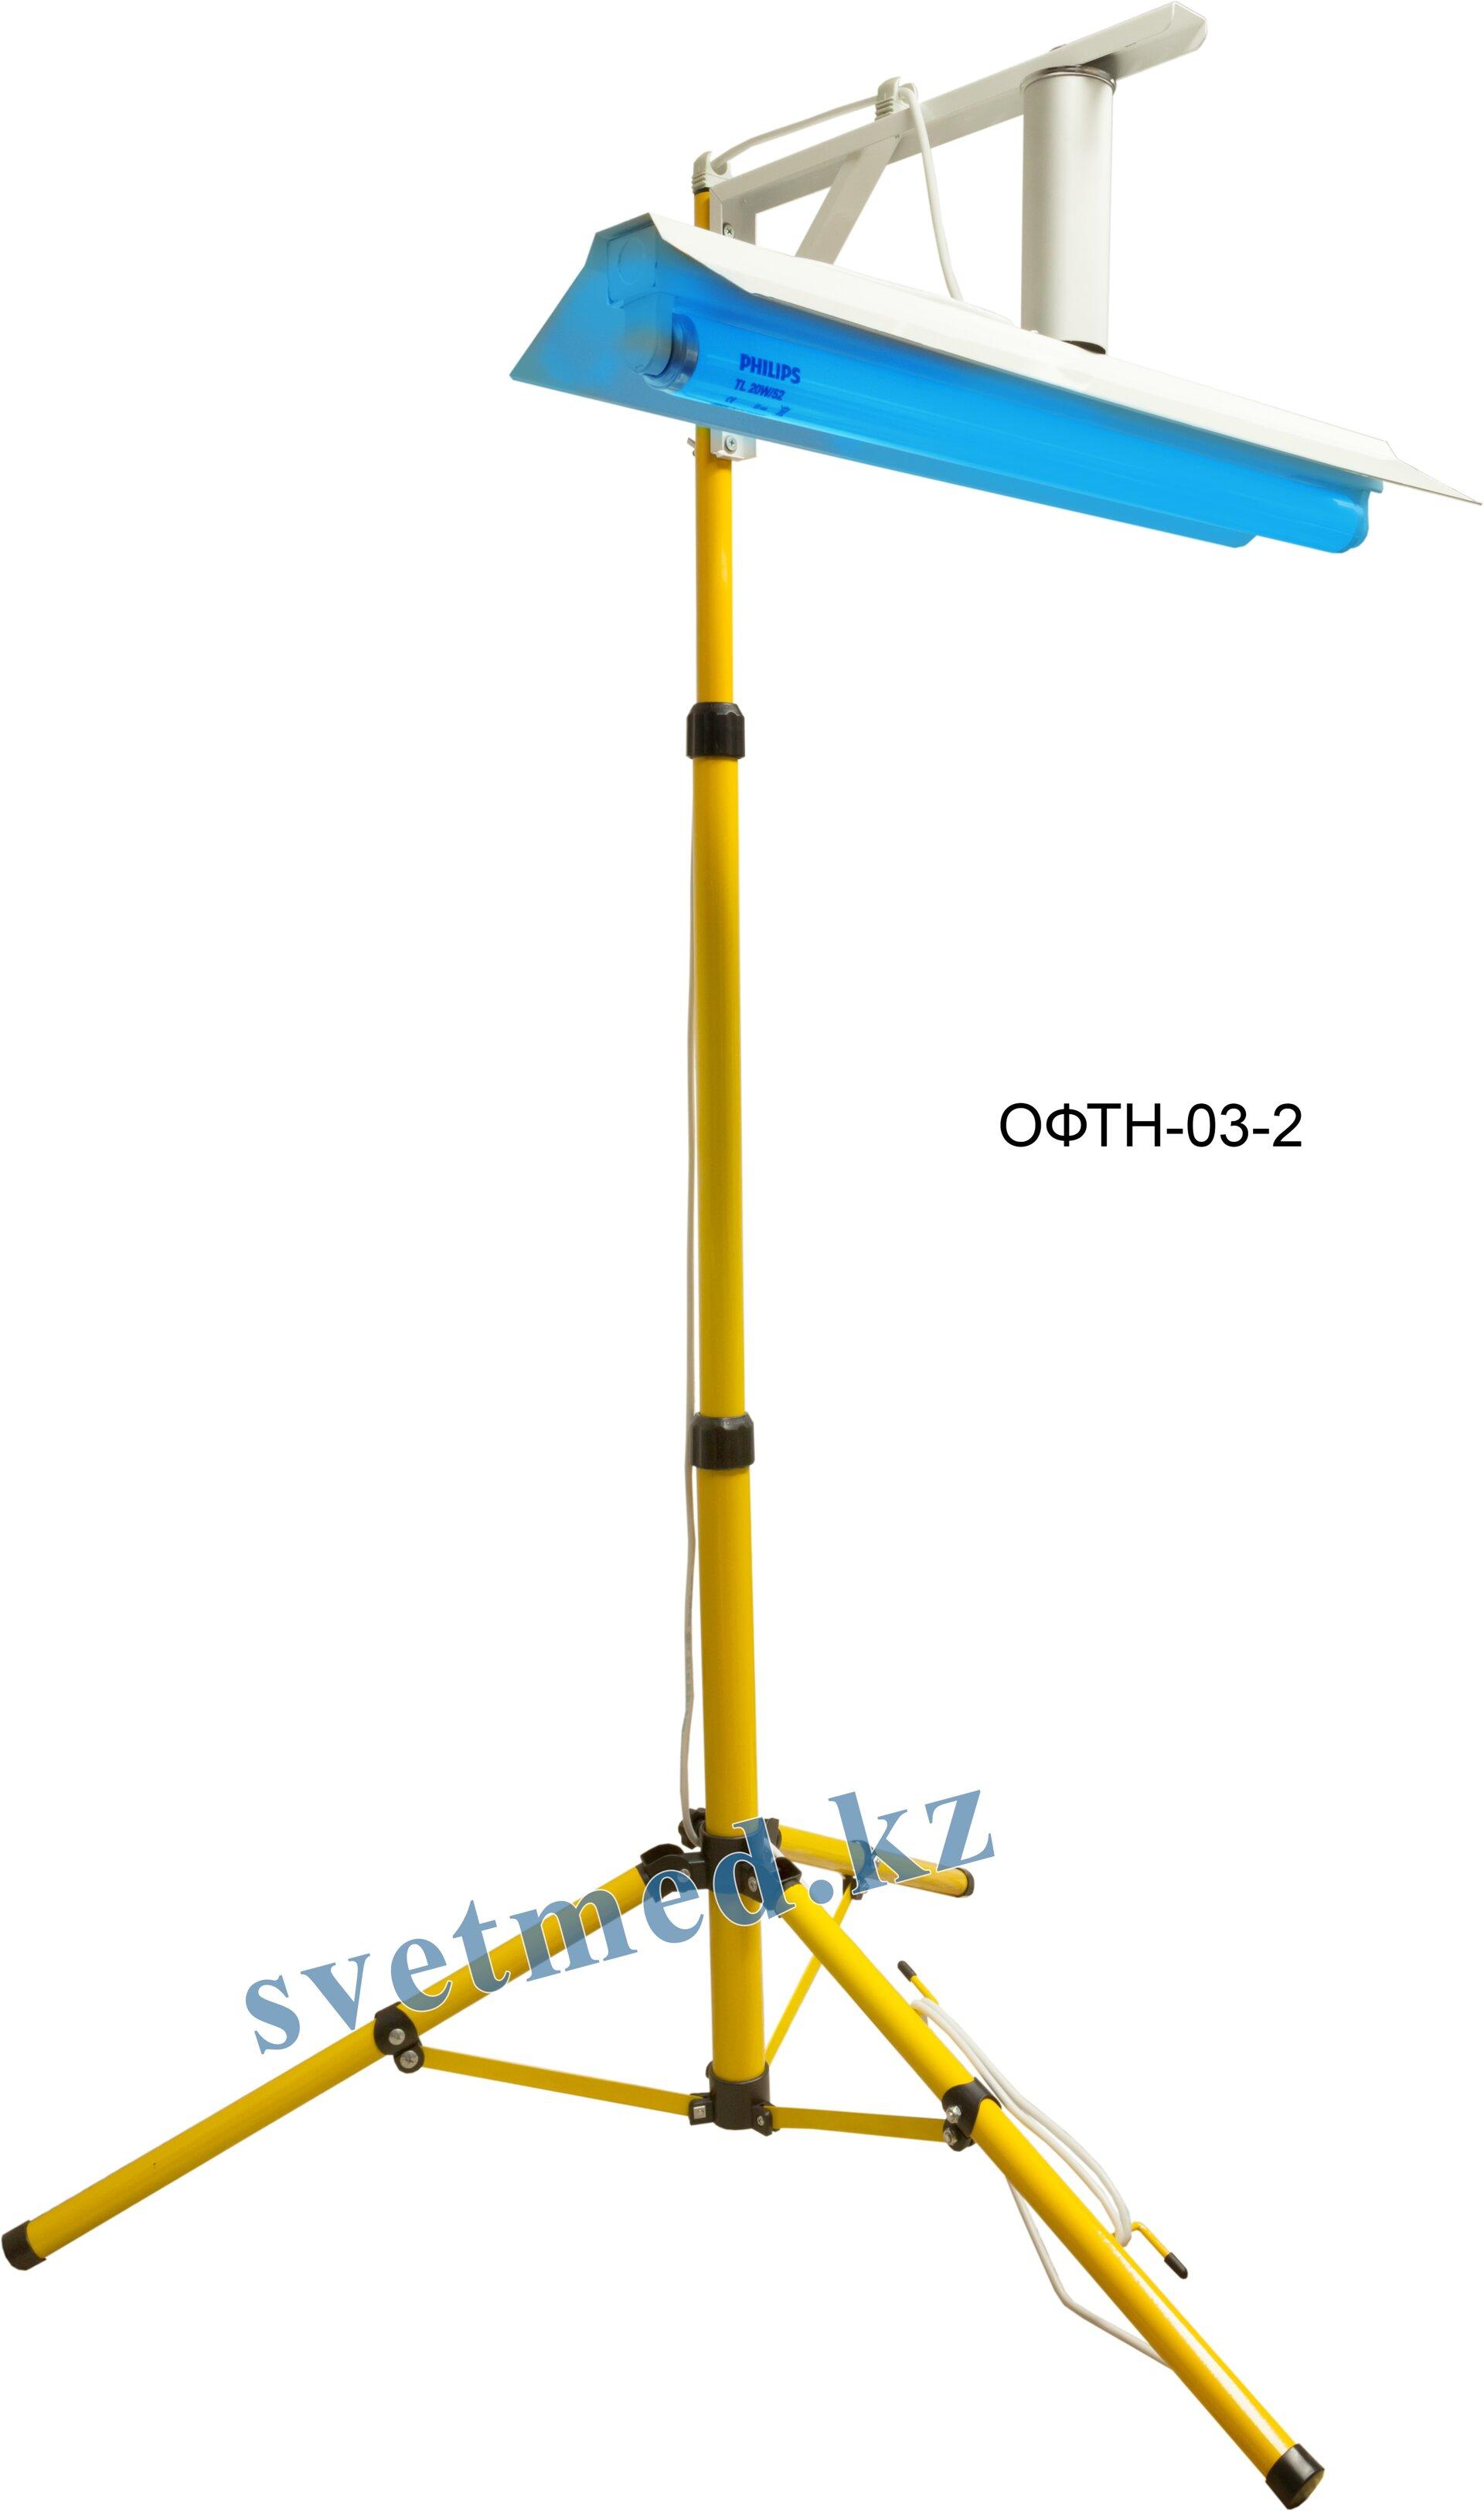 Фотолампы от желтушки - фото ОФТН-03-2.jpg